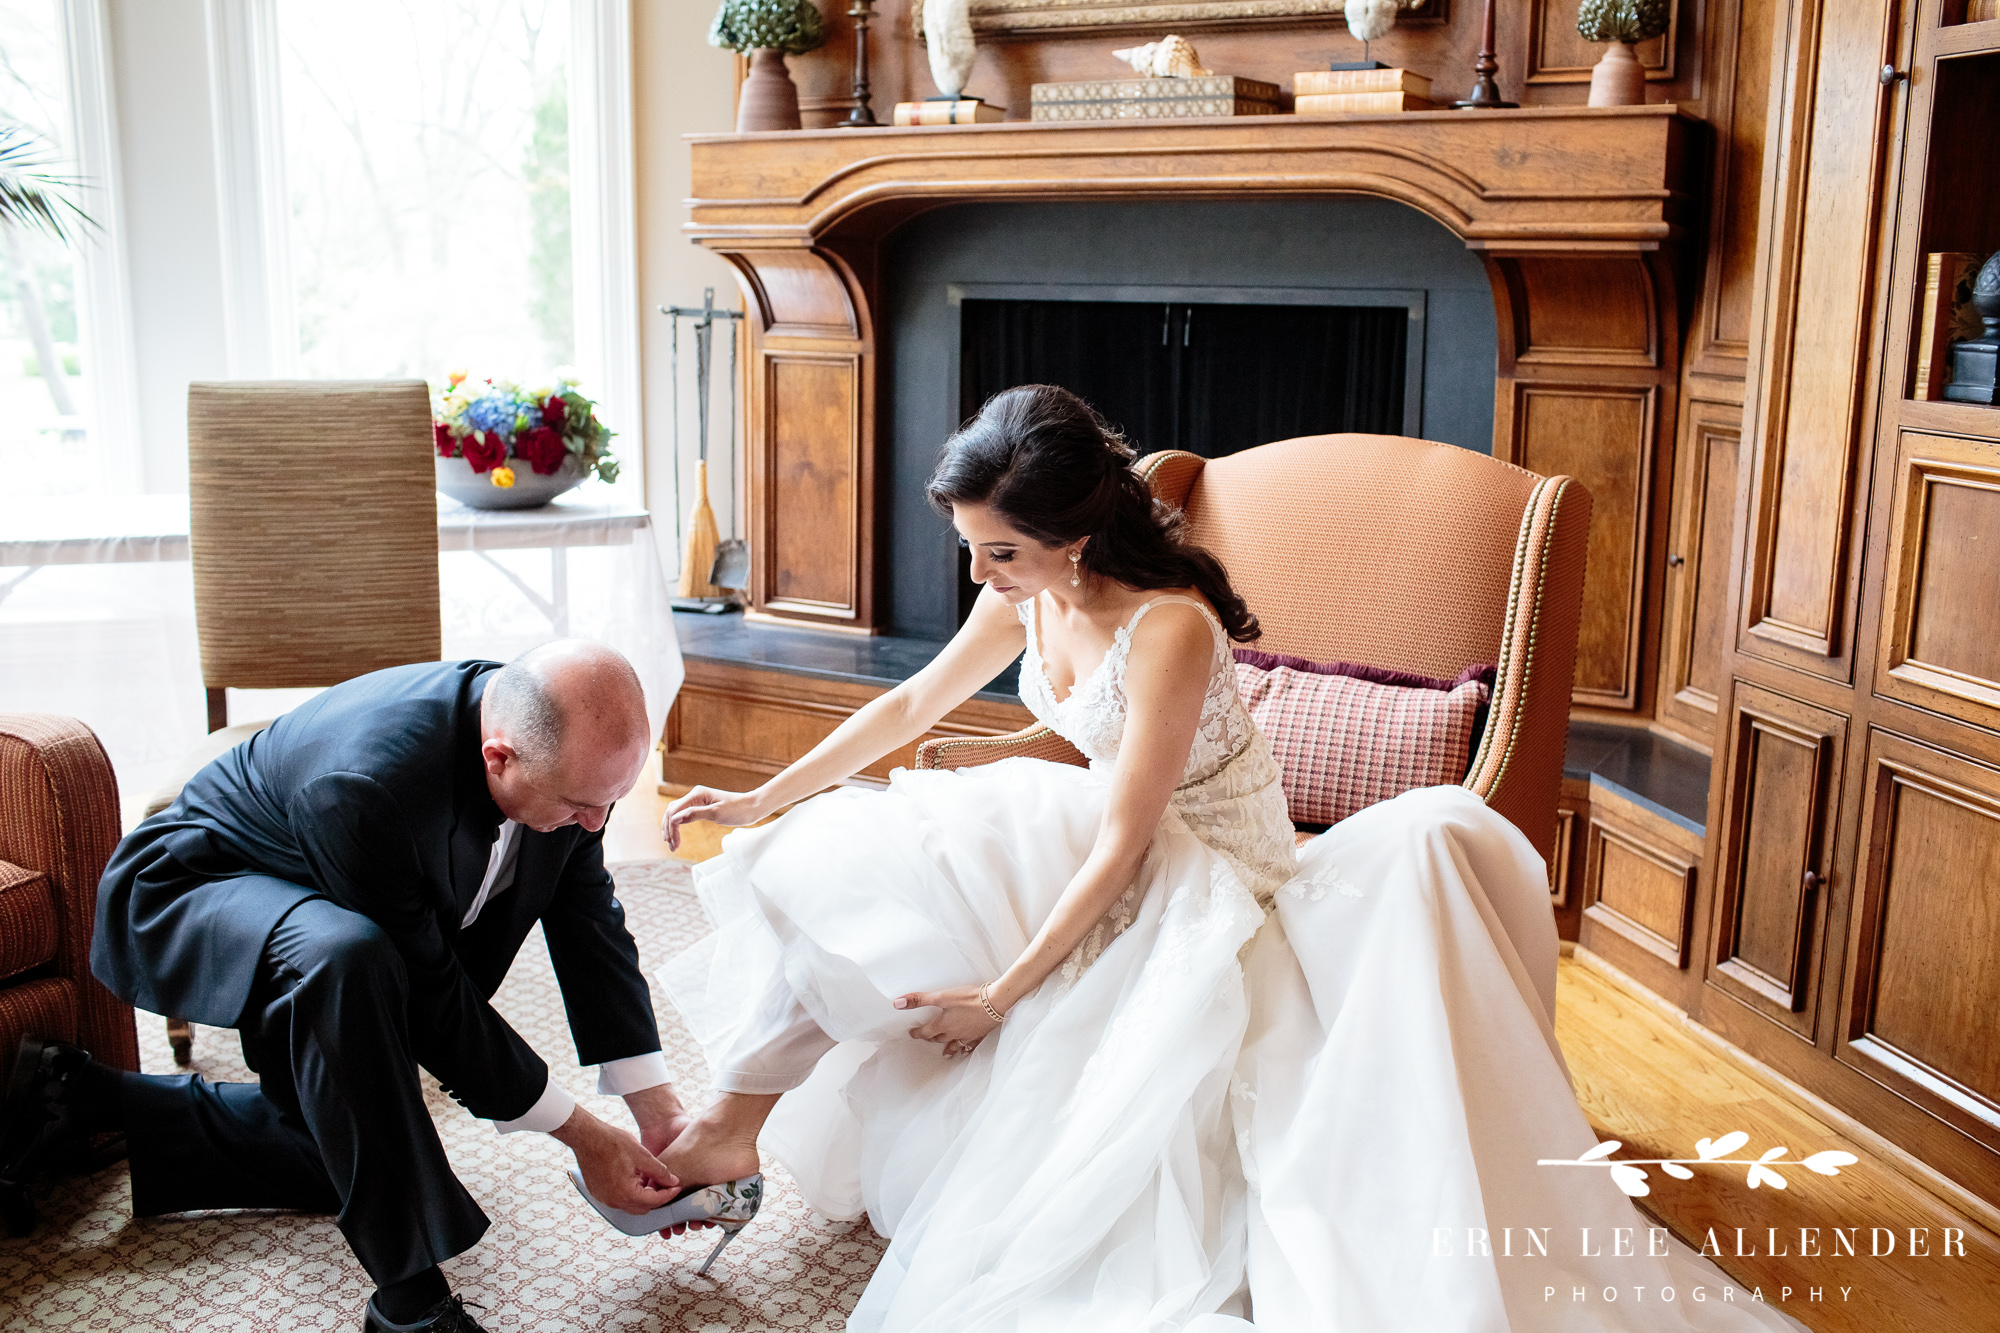 dad-helping-bride-with-shoe